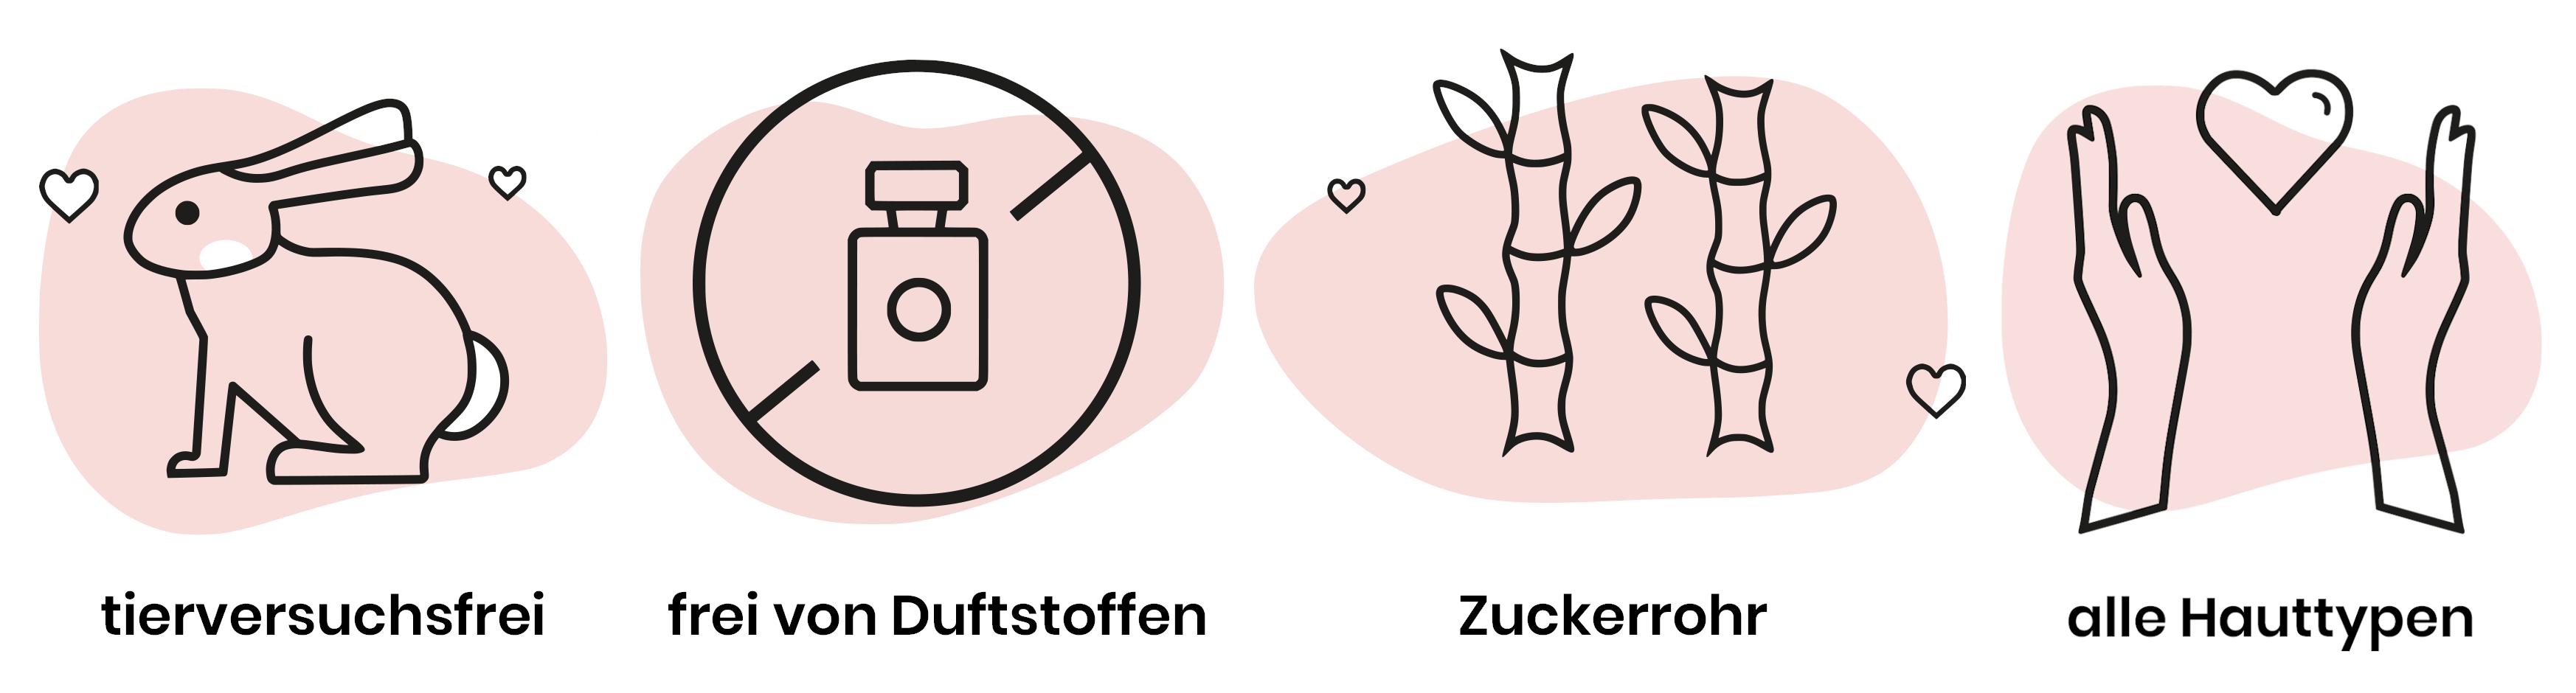 ingredients icons